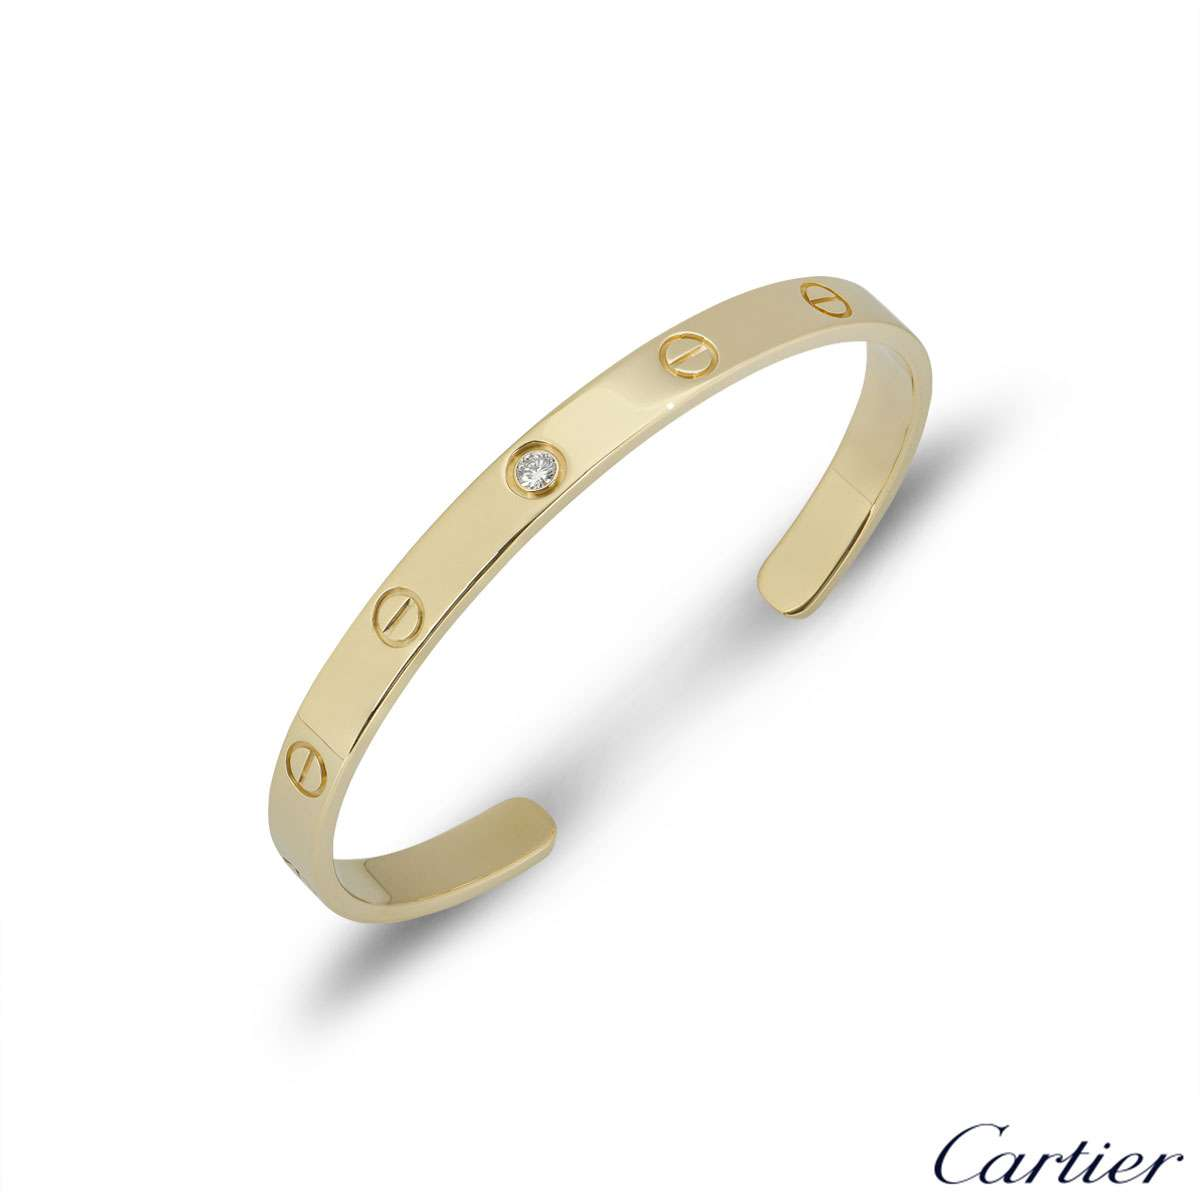 Cartier Yellow Gold Diamond Love Cuff Bracelet Size 18 B6029818